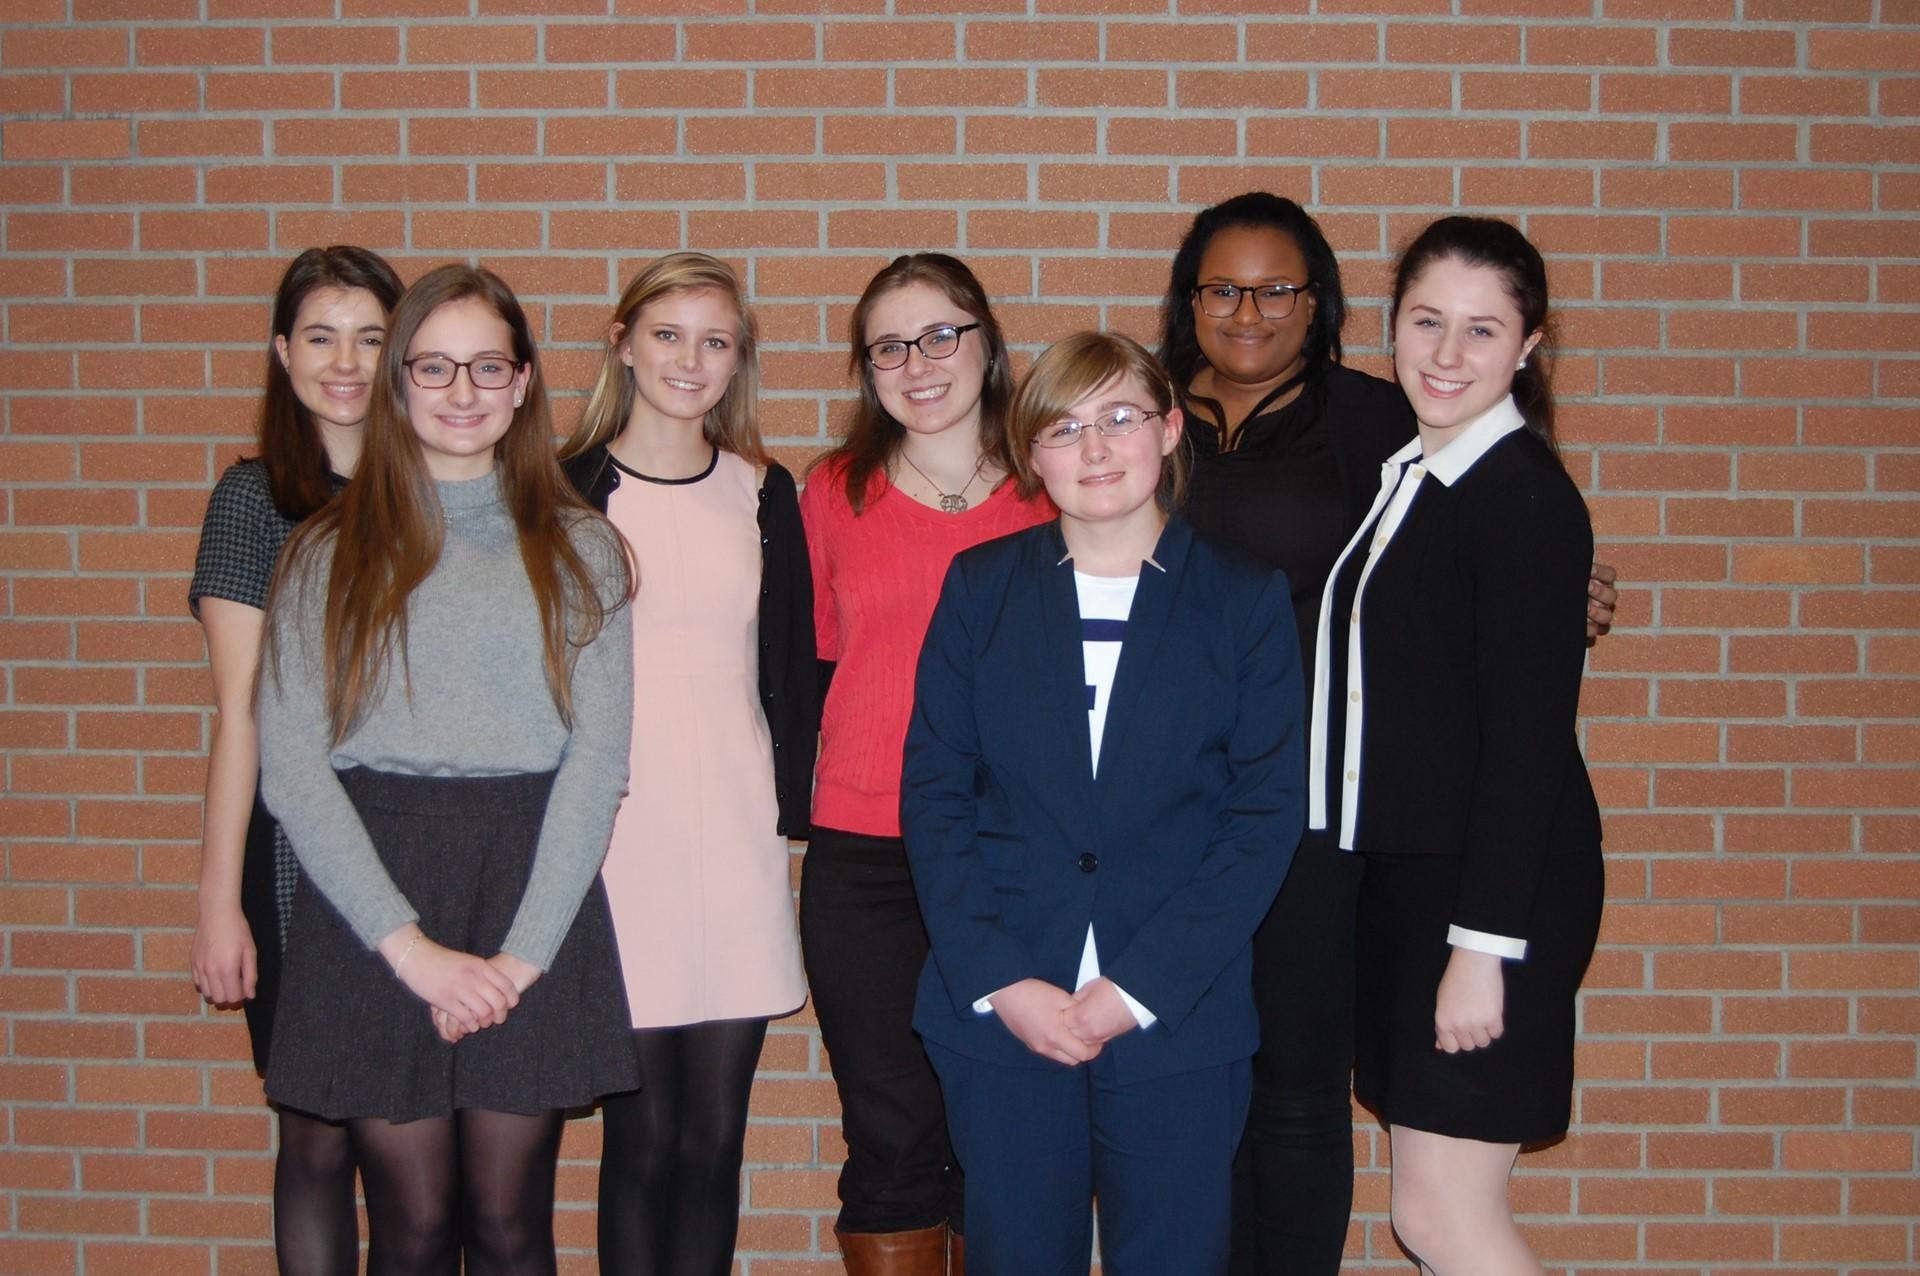 Saint Ursula Academy Team Wins First Ever High School Ethics Bowl